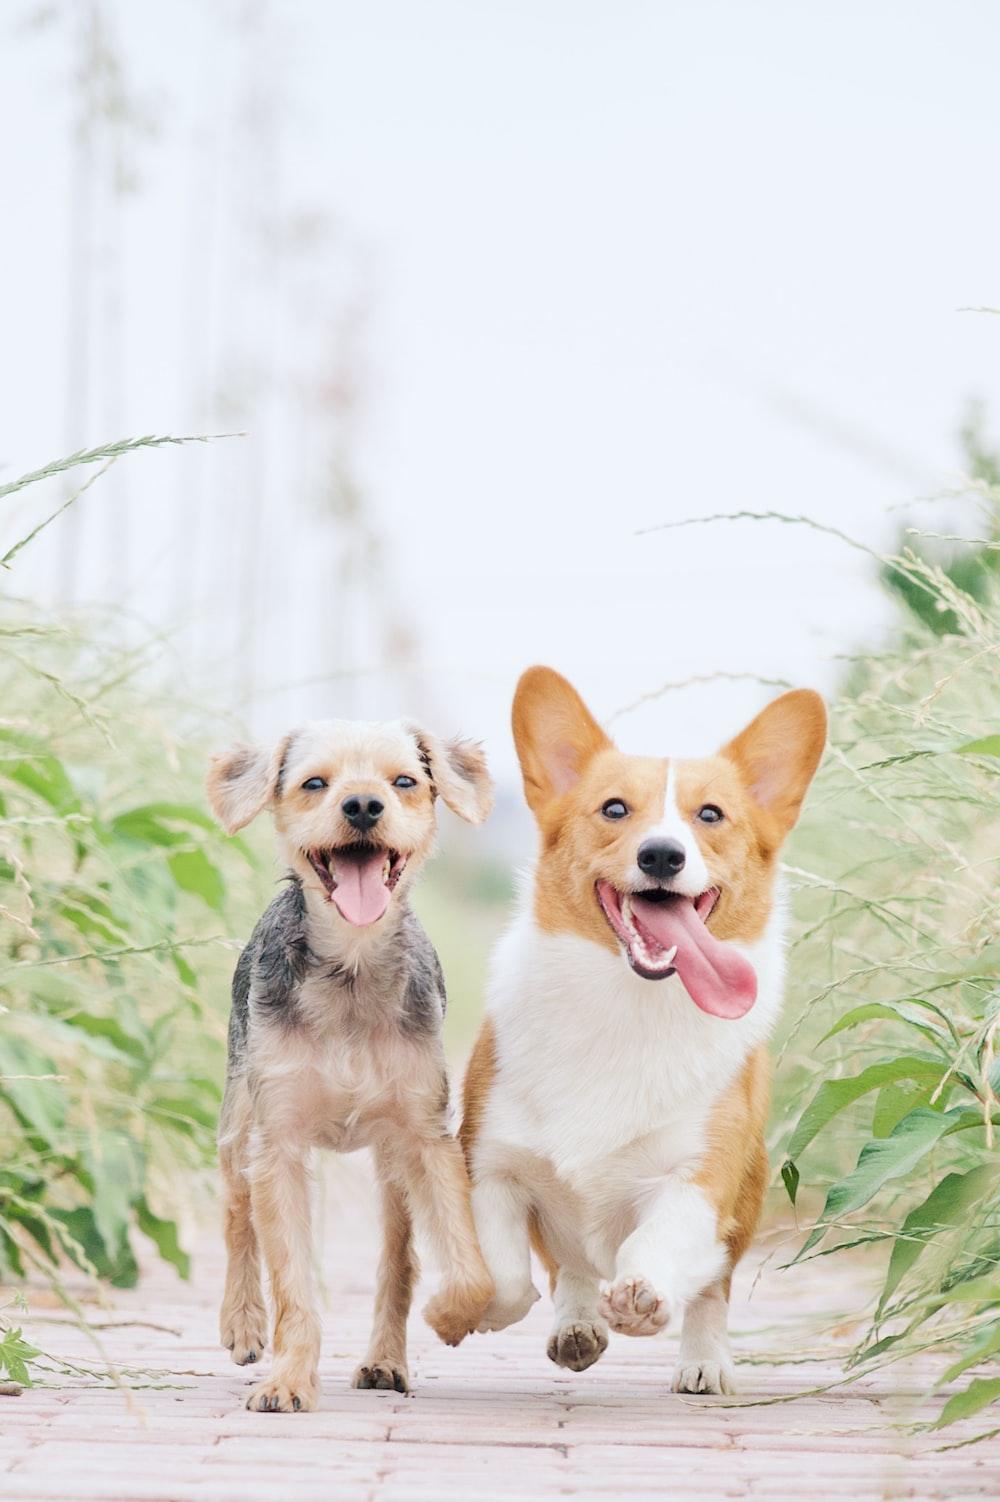 white and brown corgi besides brown dog